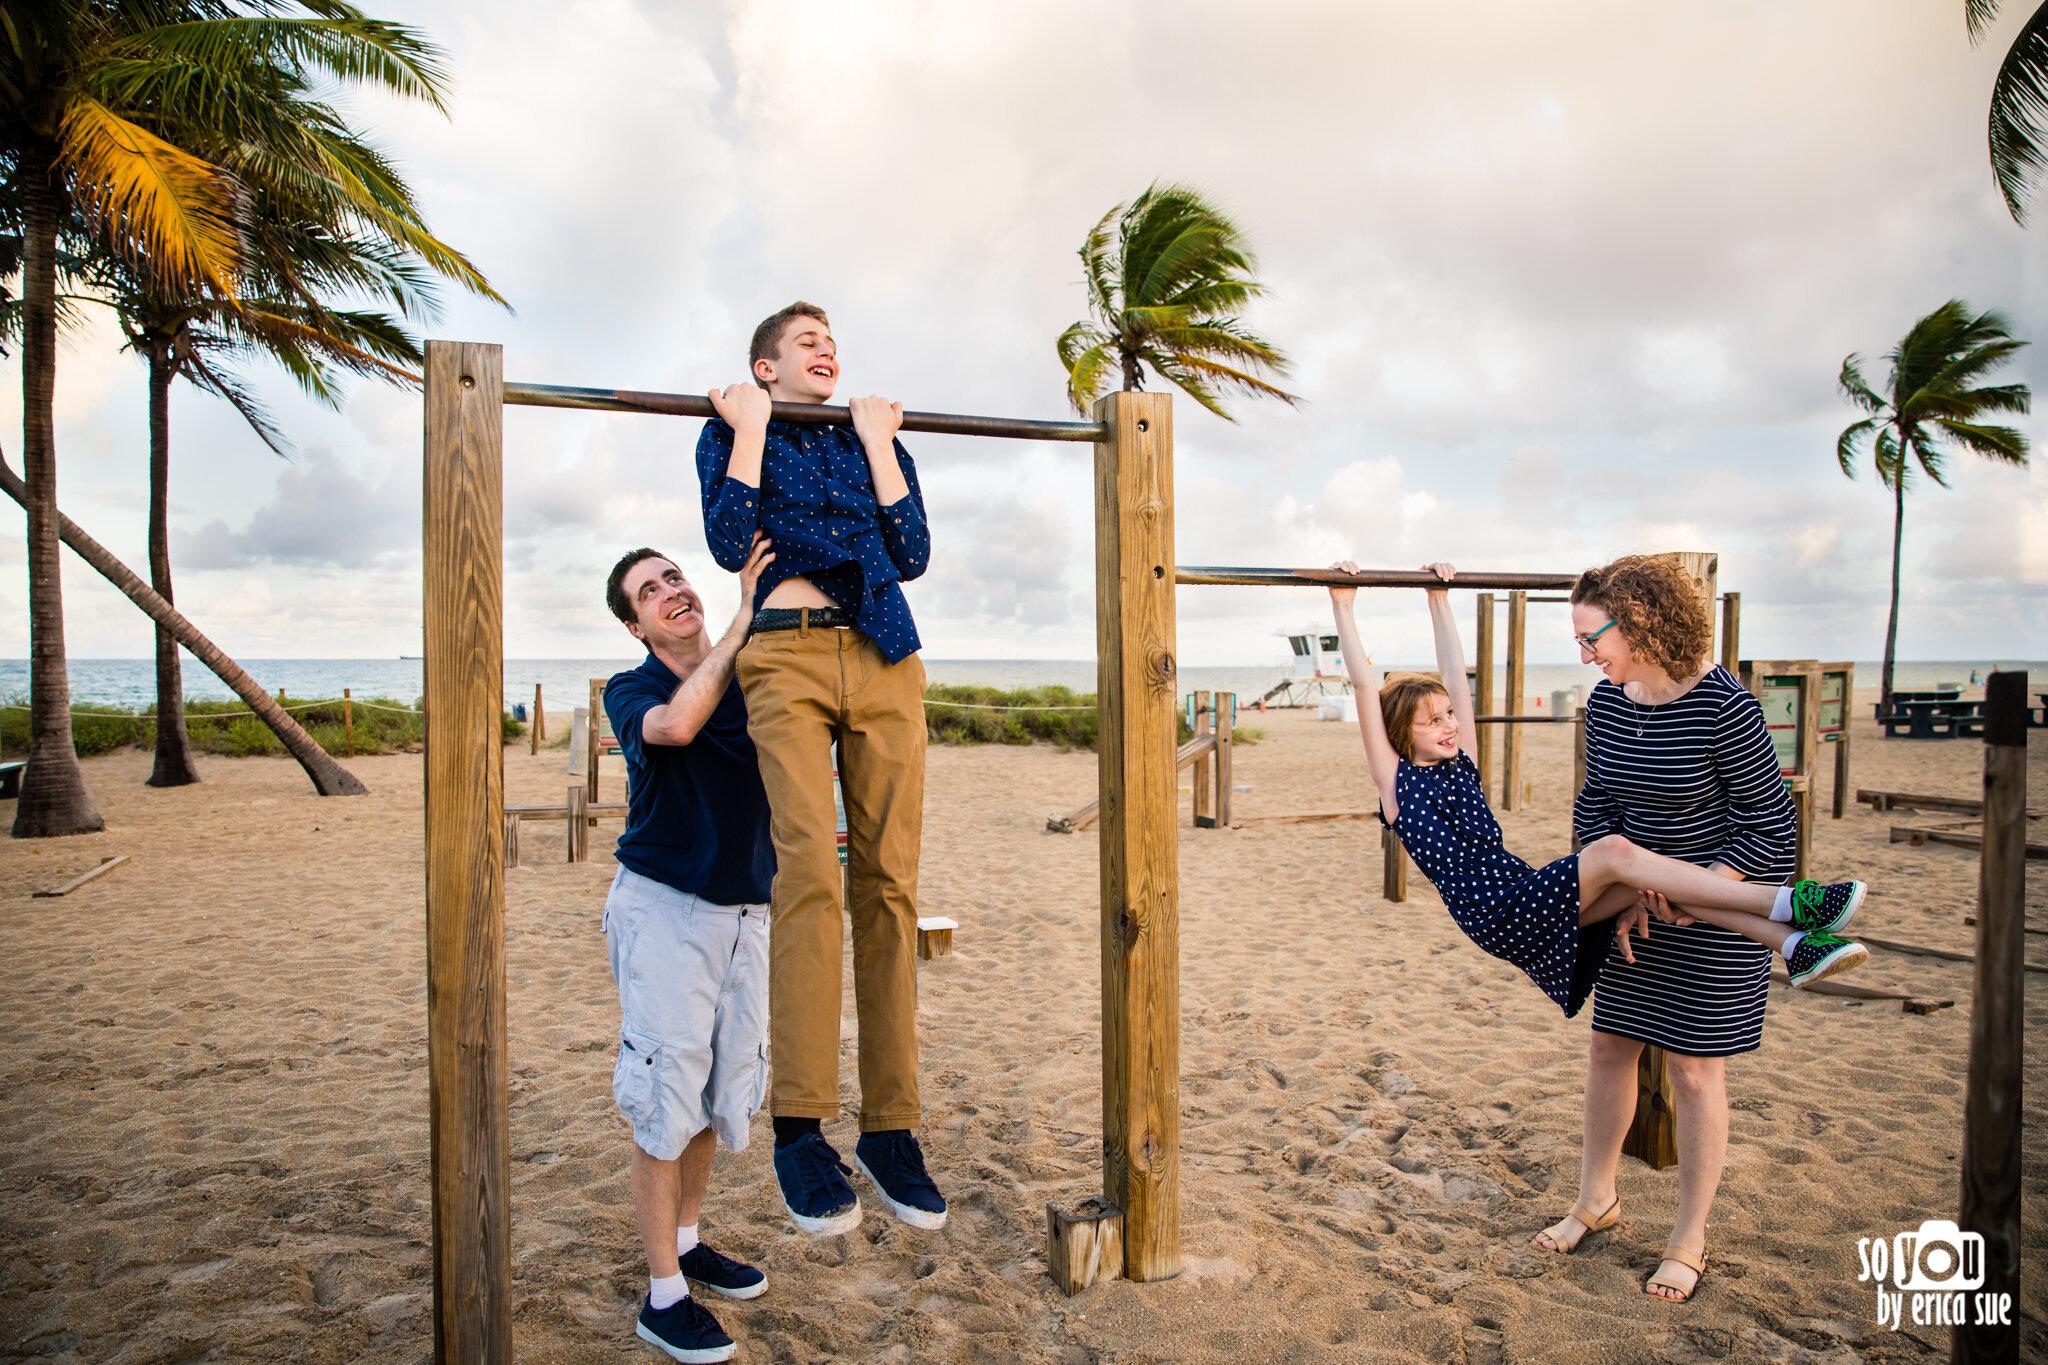 so-you-by-erica-sue-ft-lauderdale-beach-basketball-mitzvah-pre-shoot--5.JPG